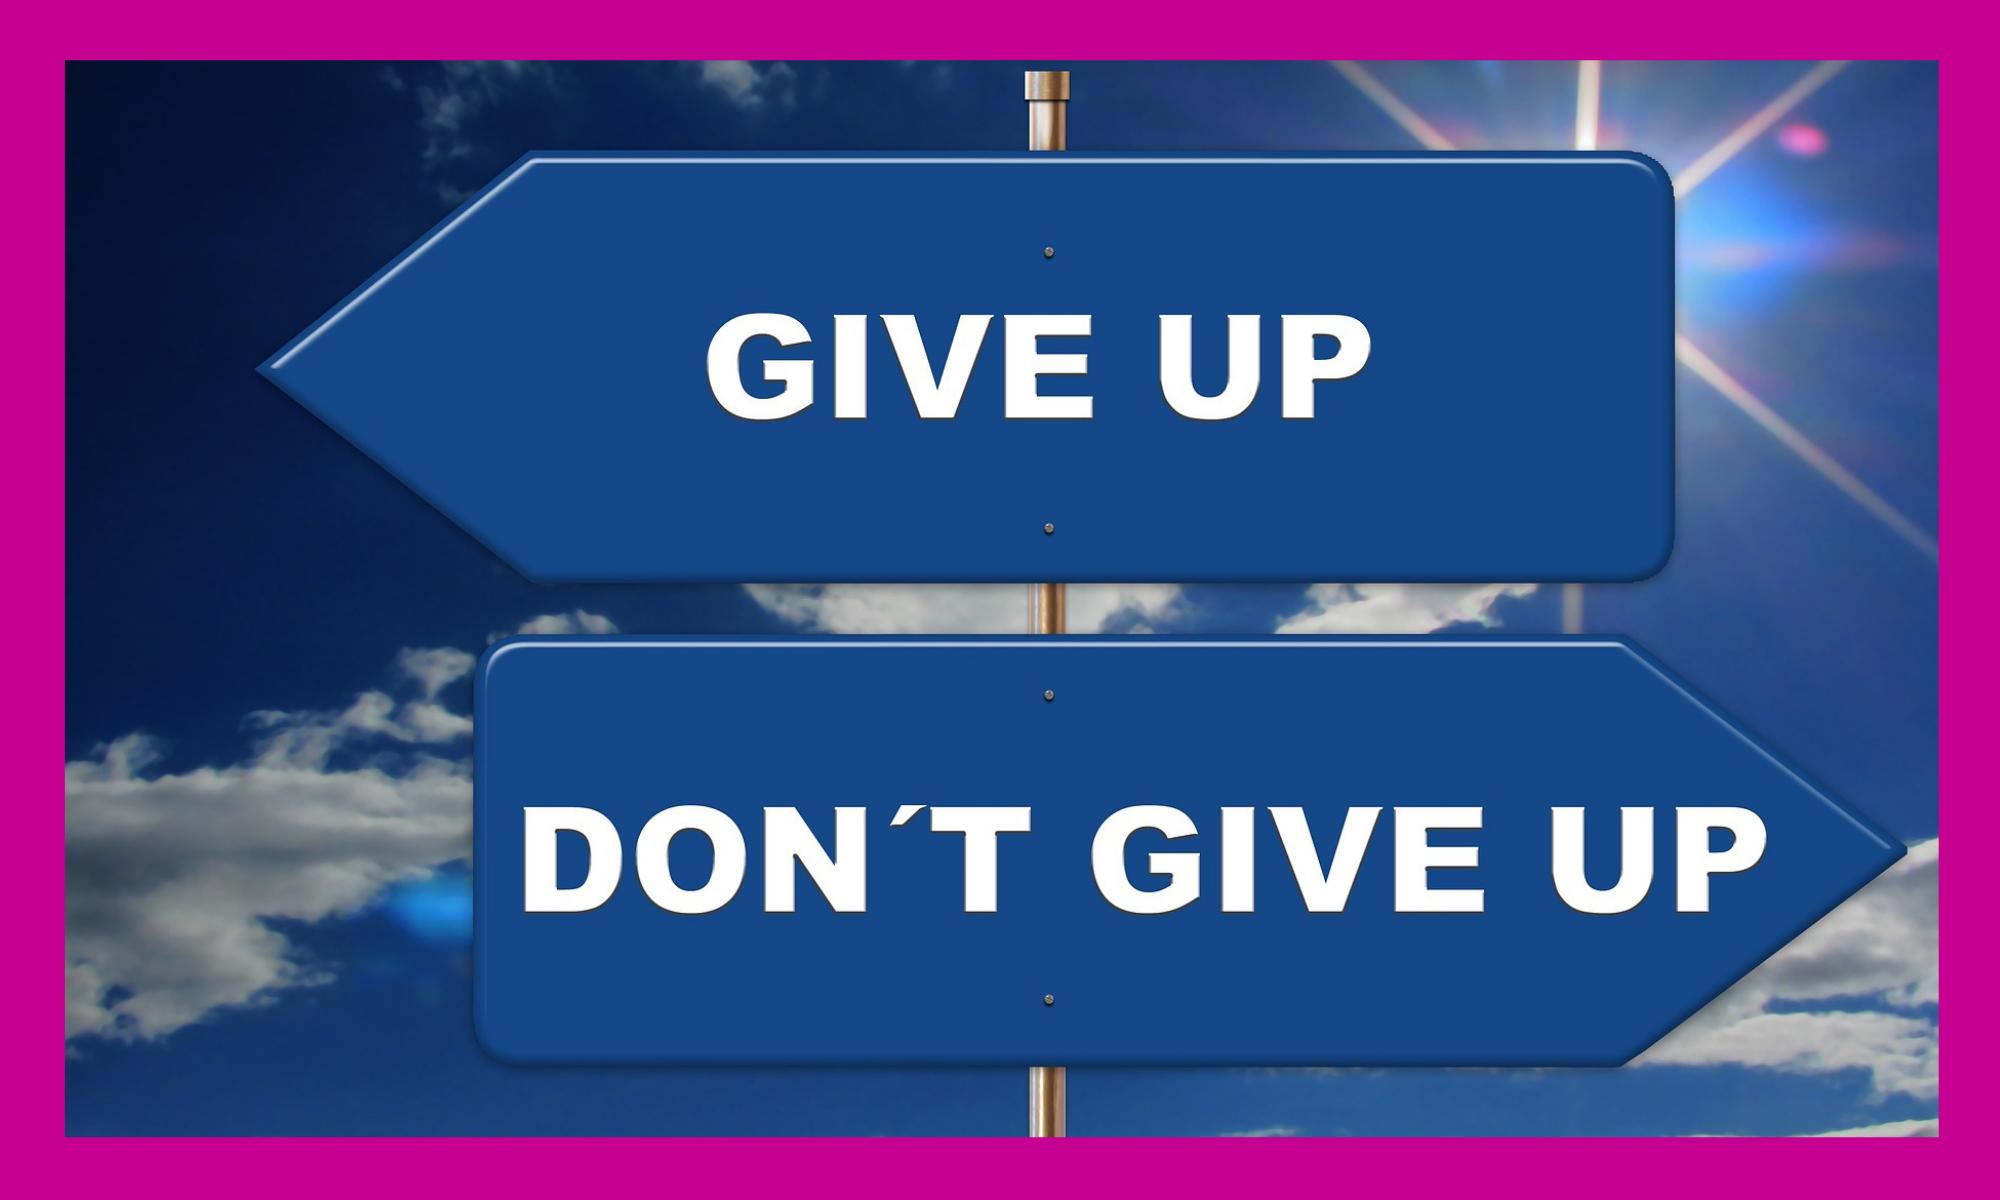 Gib' niemals auf